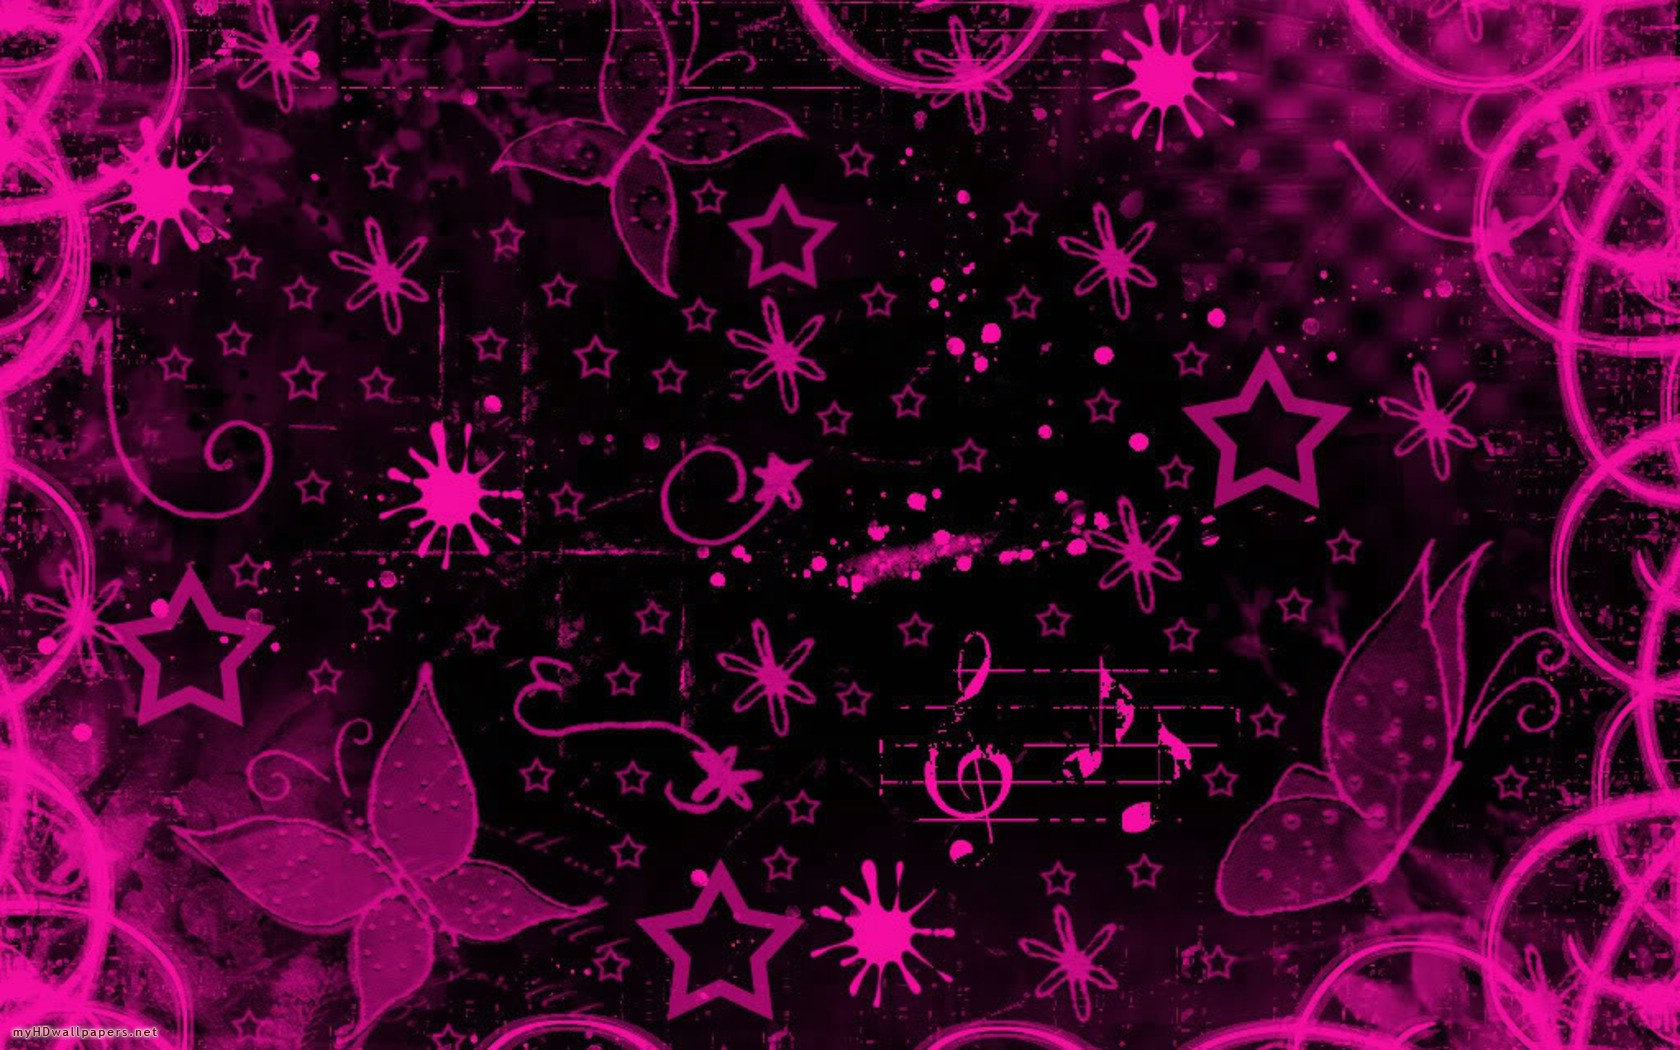 Pink black design   Desktop Wallpaper HD Wallpapers Download and 1680x1050